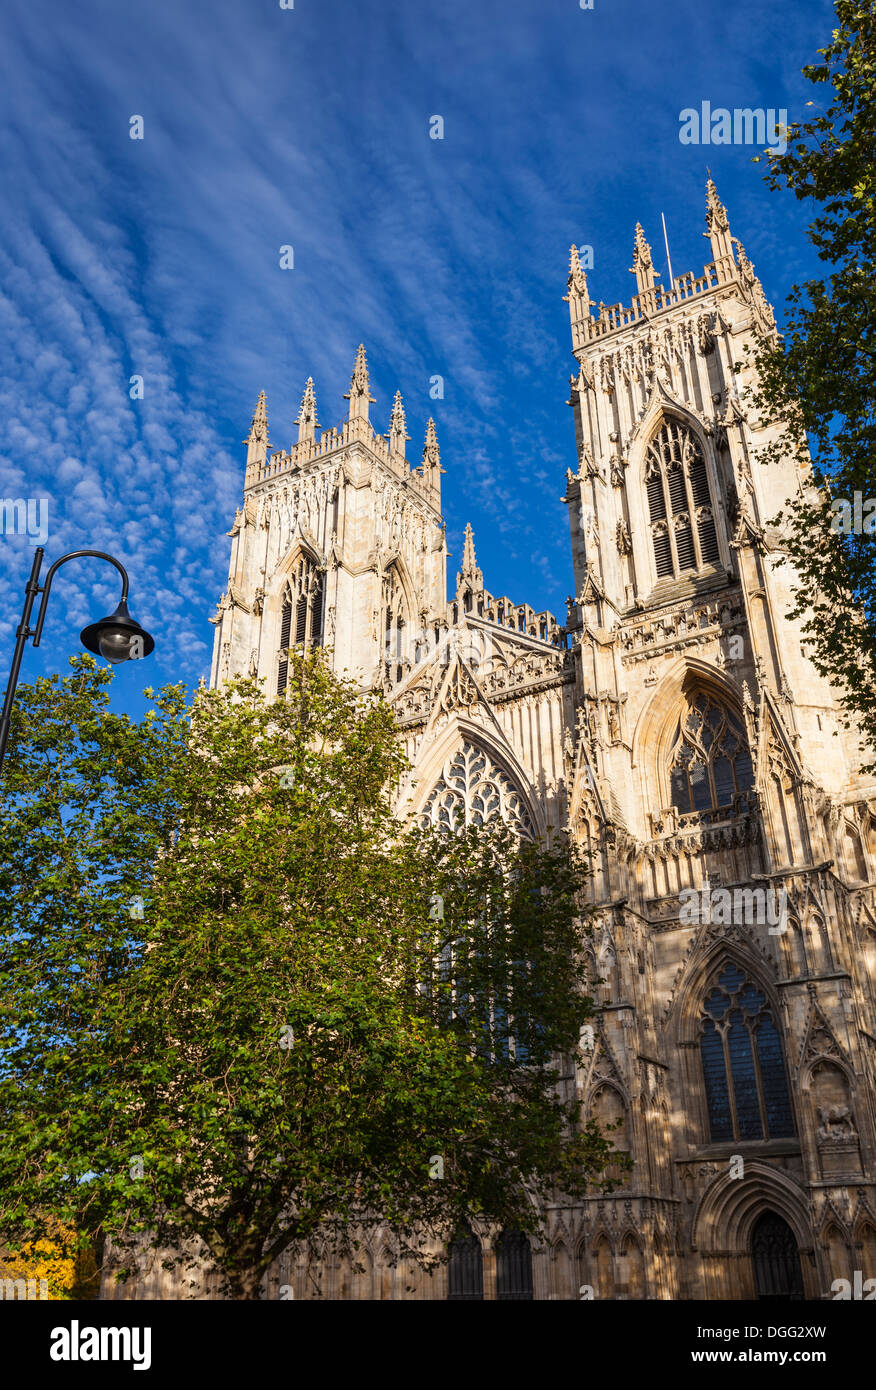 Western facade of York Minster in York, England, UK - Stock Image